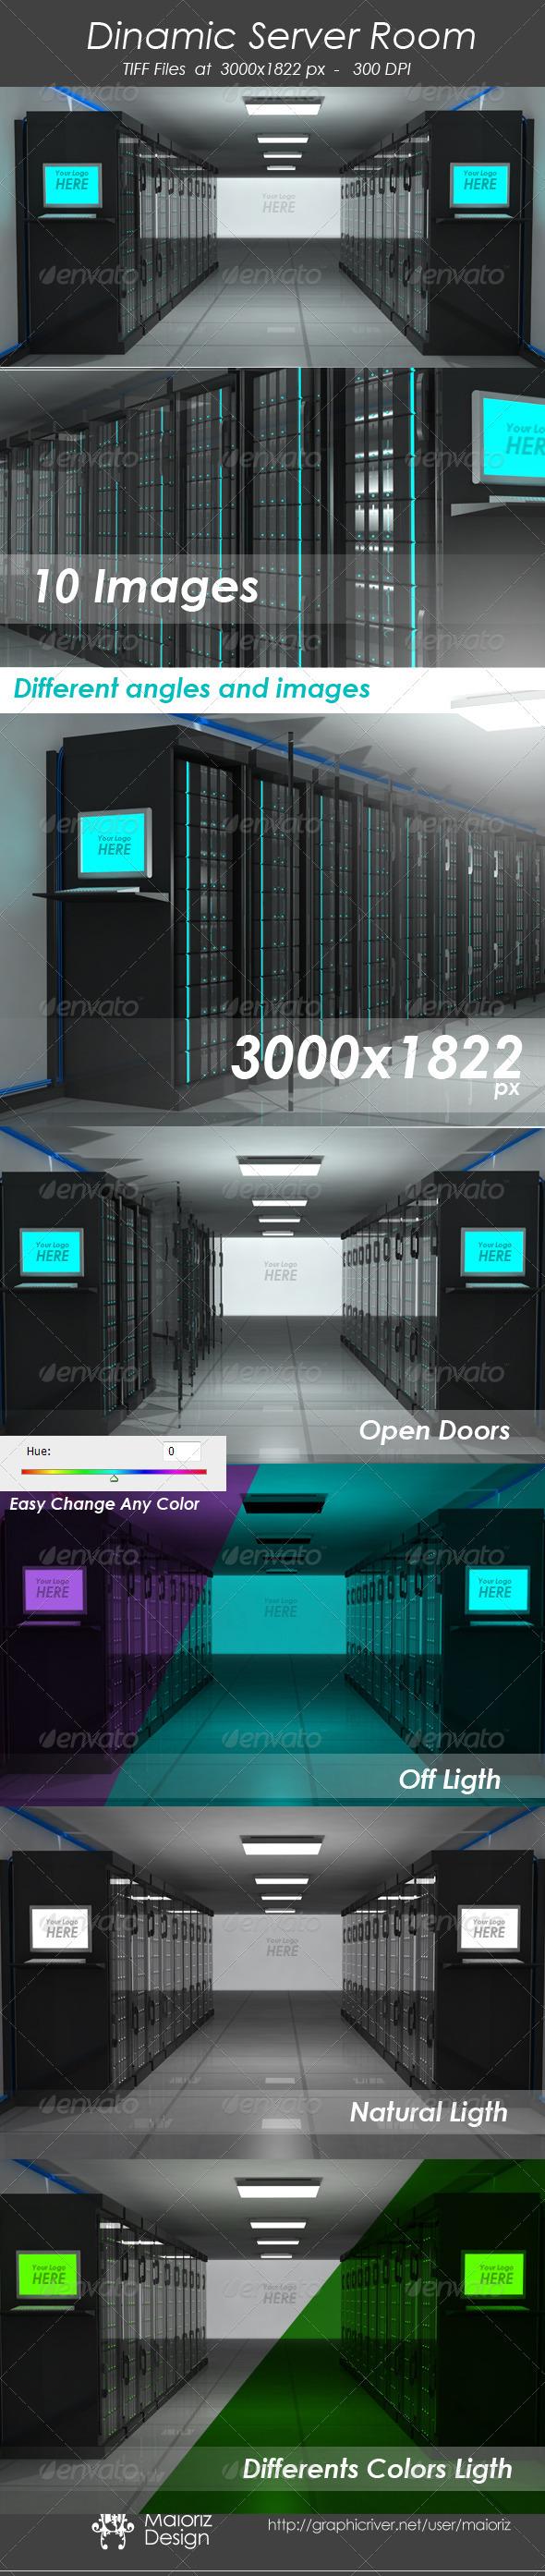 Dinamic Servers Room - Technology 3D Renders